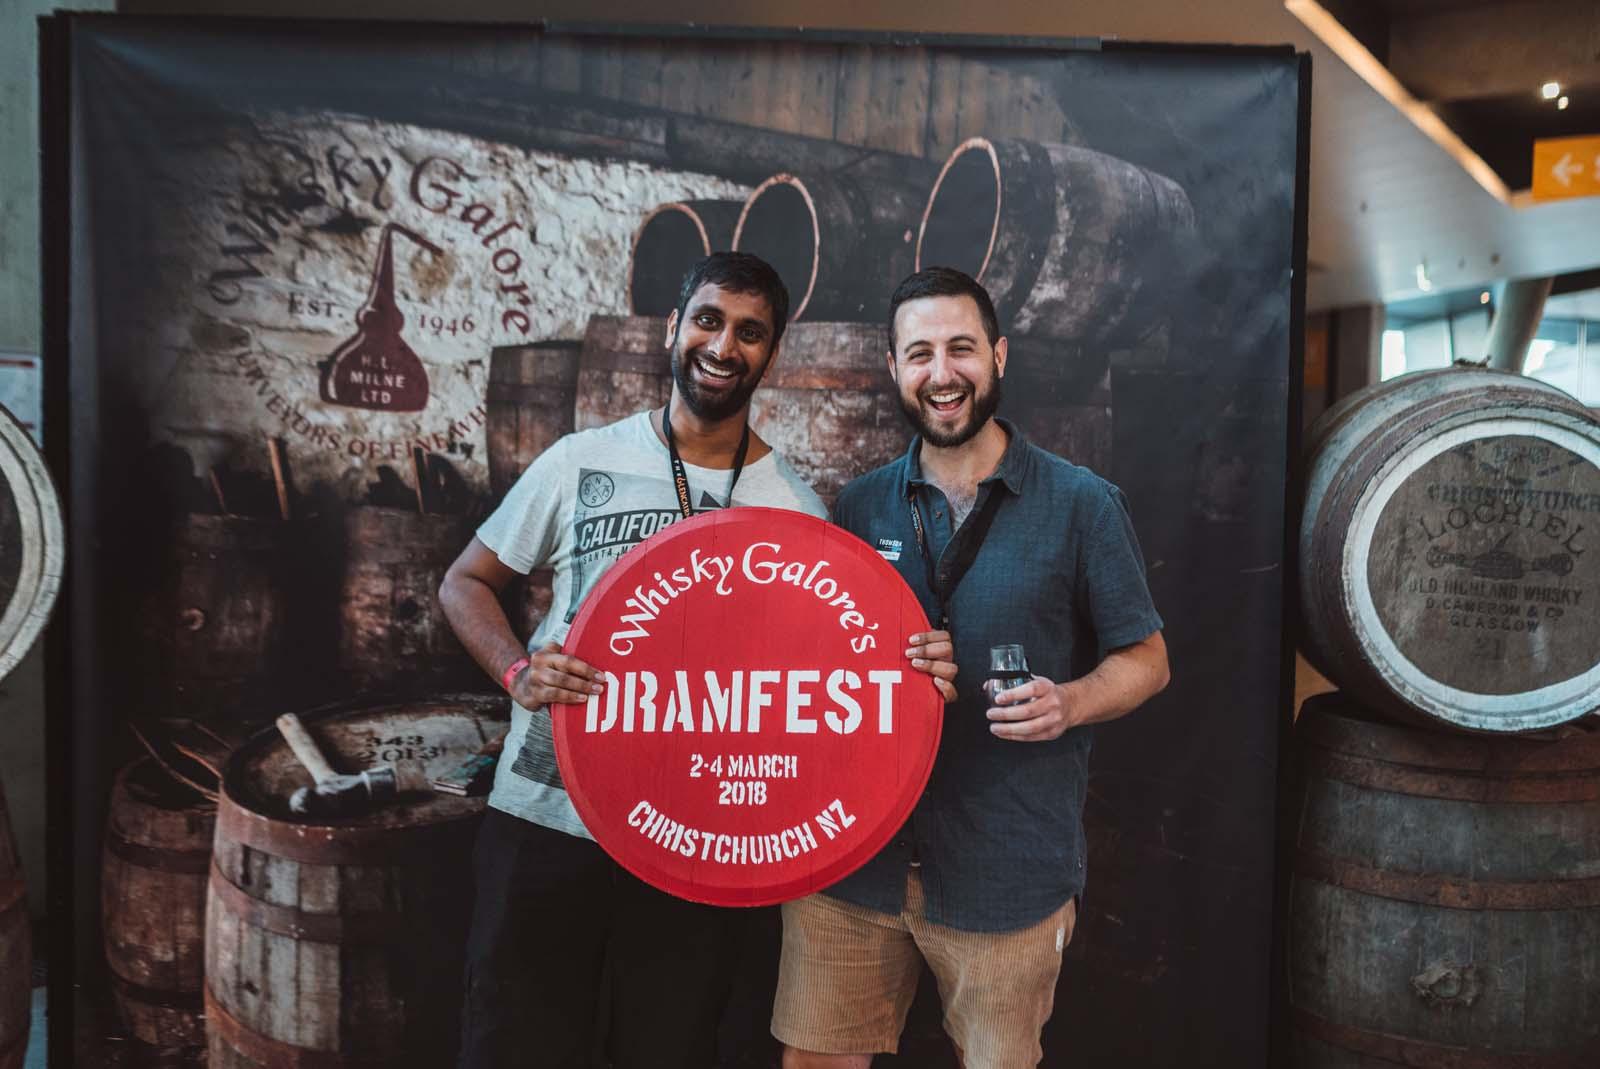 Dramfest 2018 for Whisky Galore-144.jpg